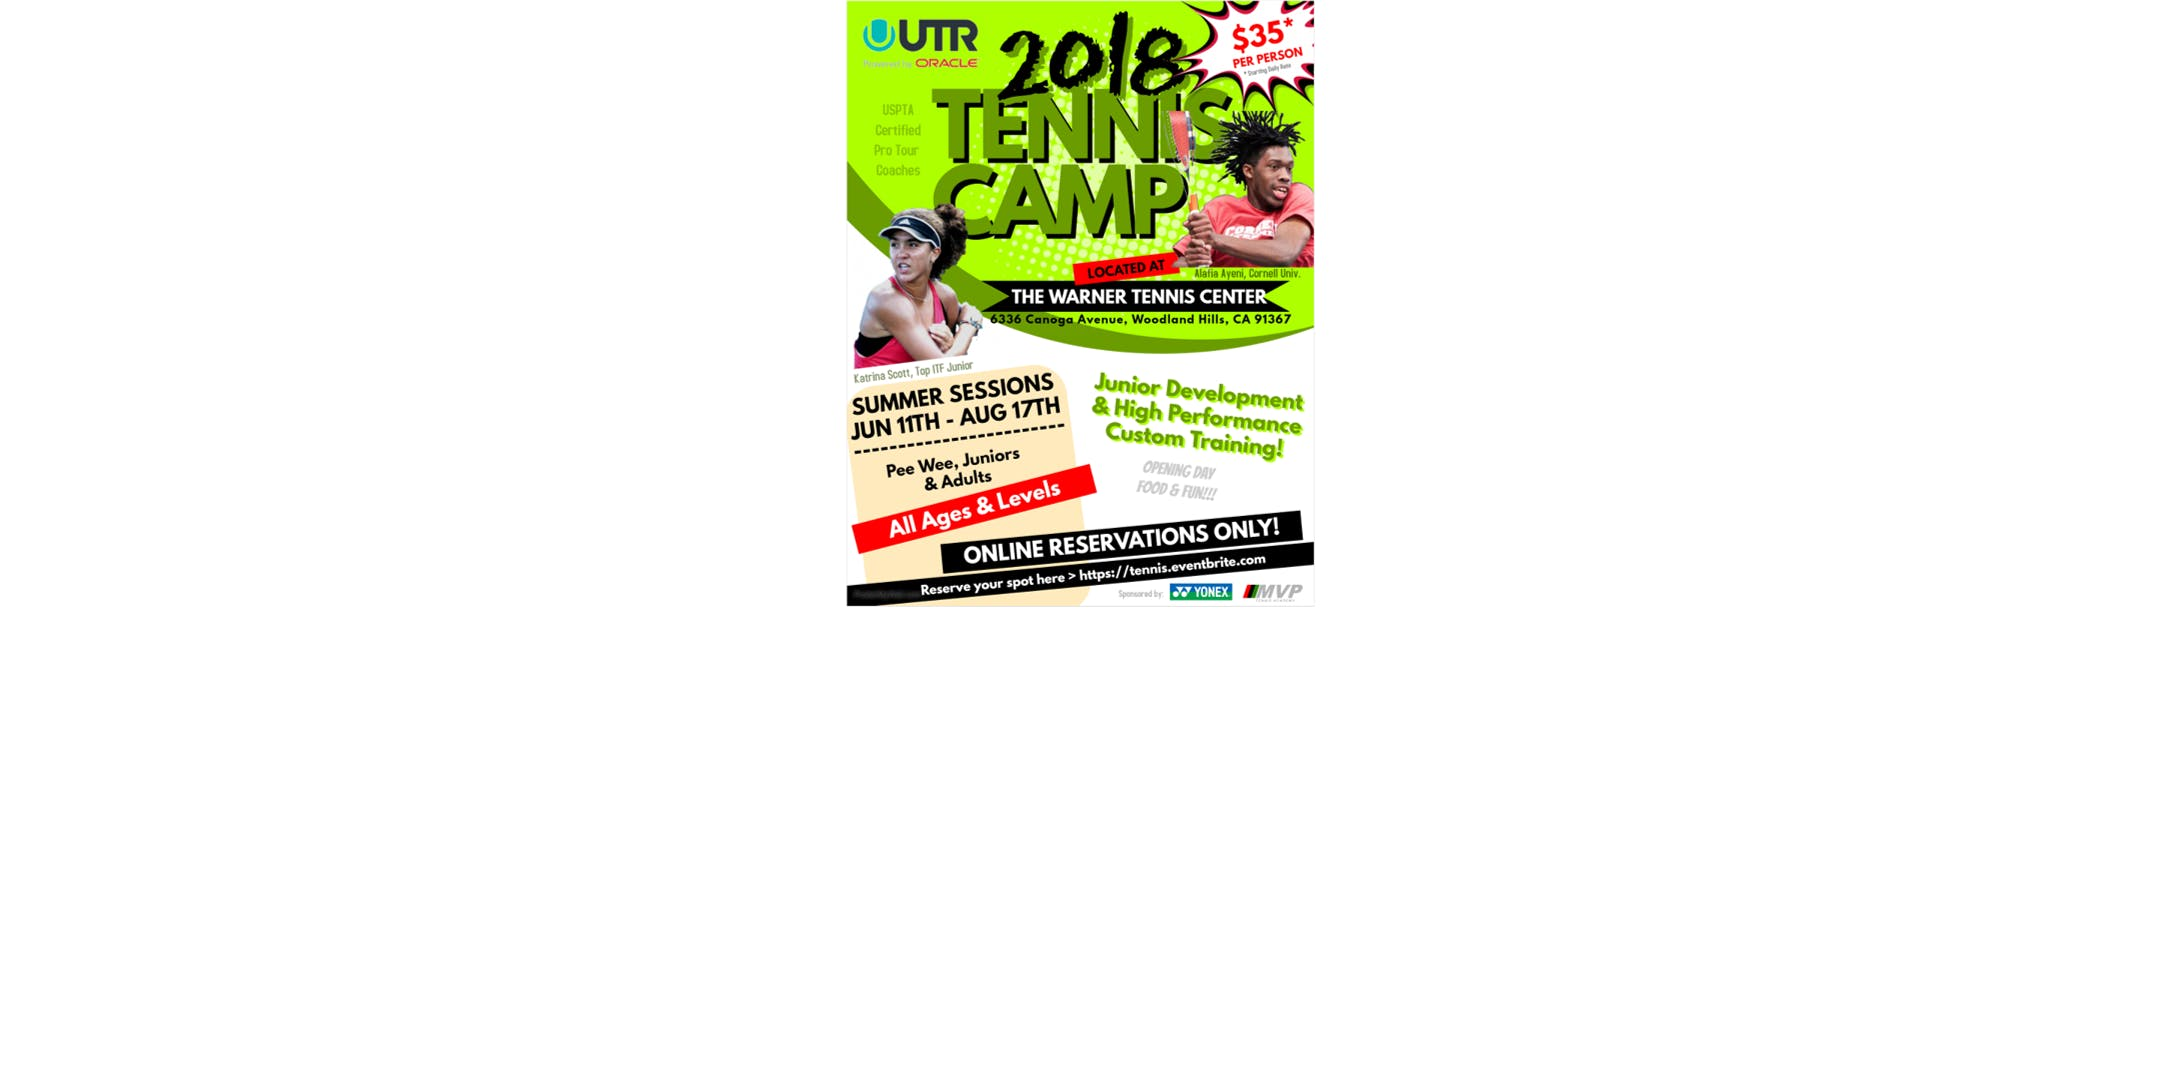 Tennis Summer Camp by Yonex   High Performanc